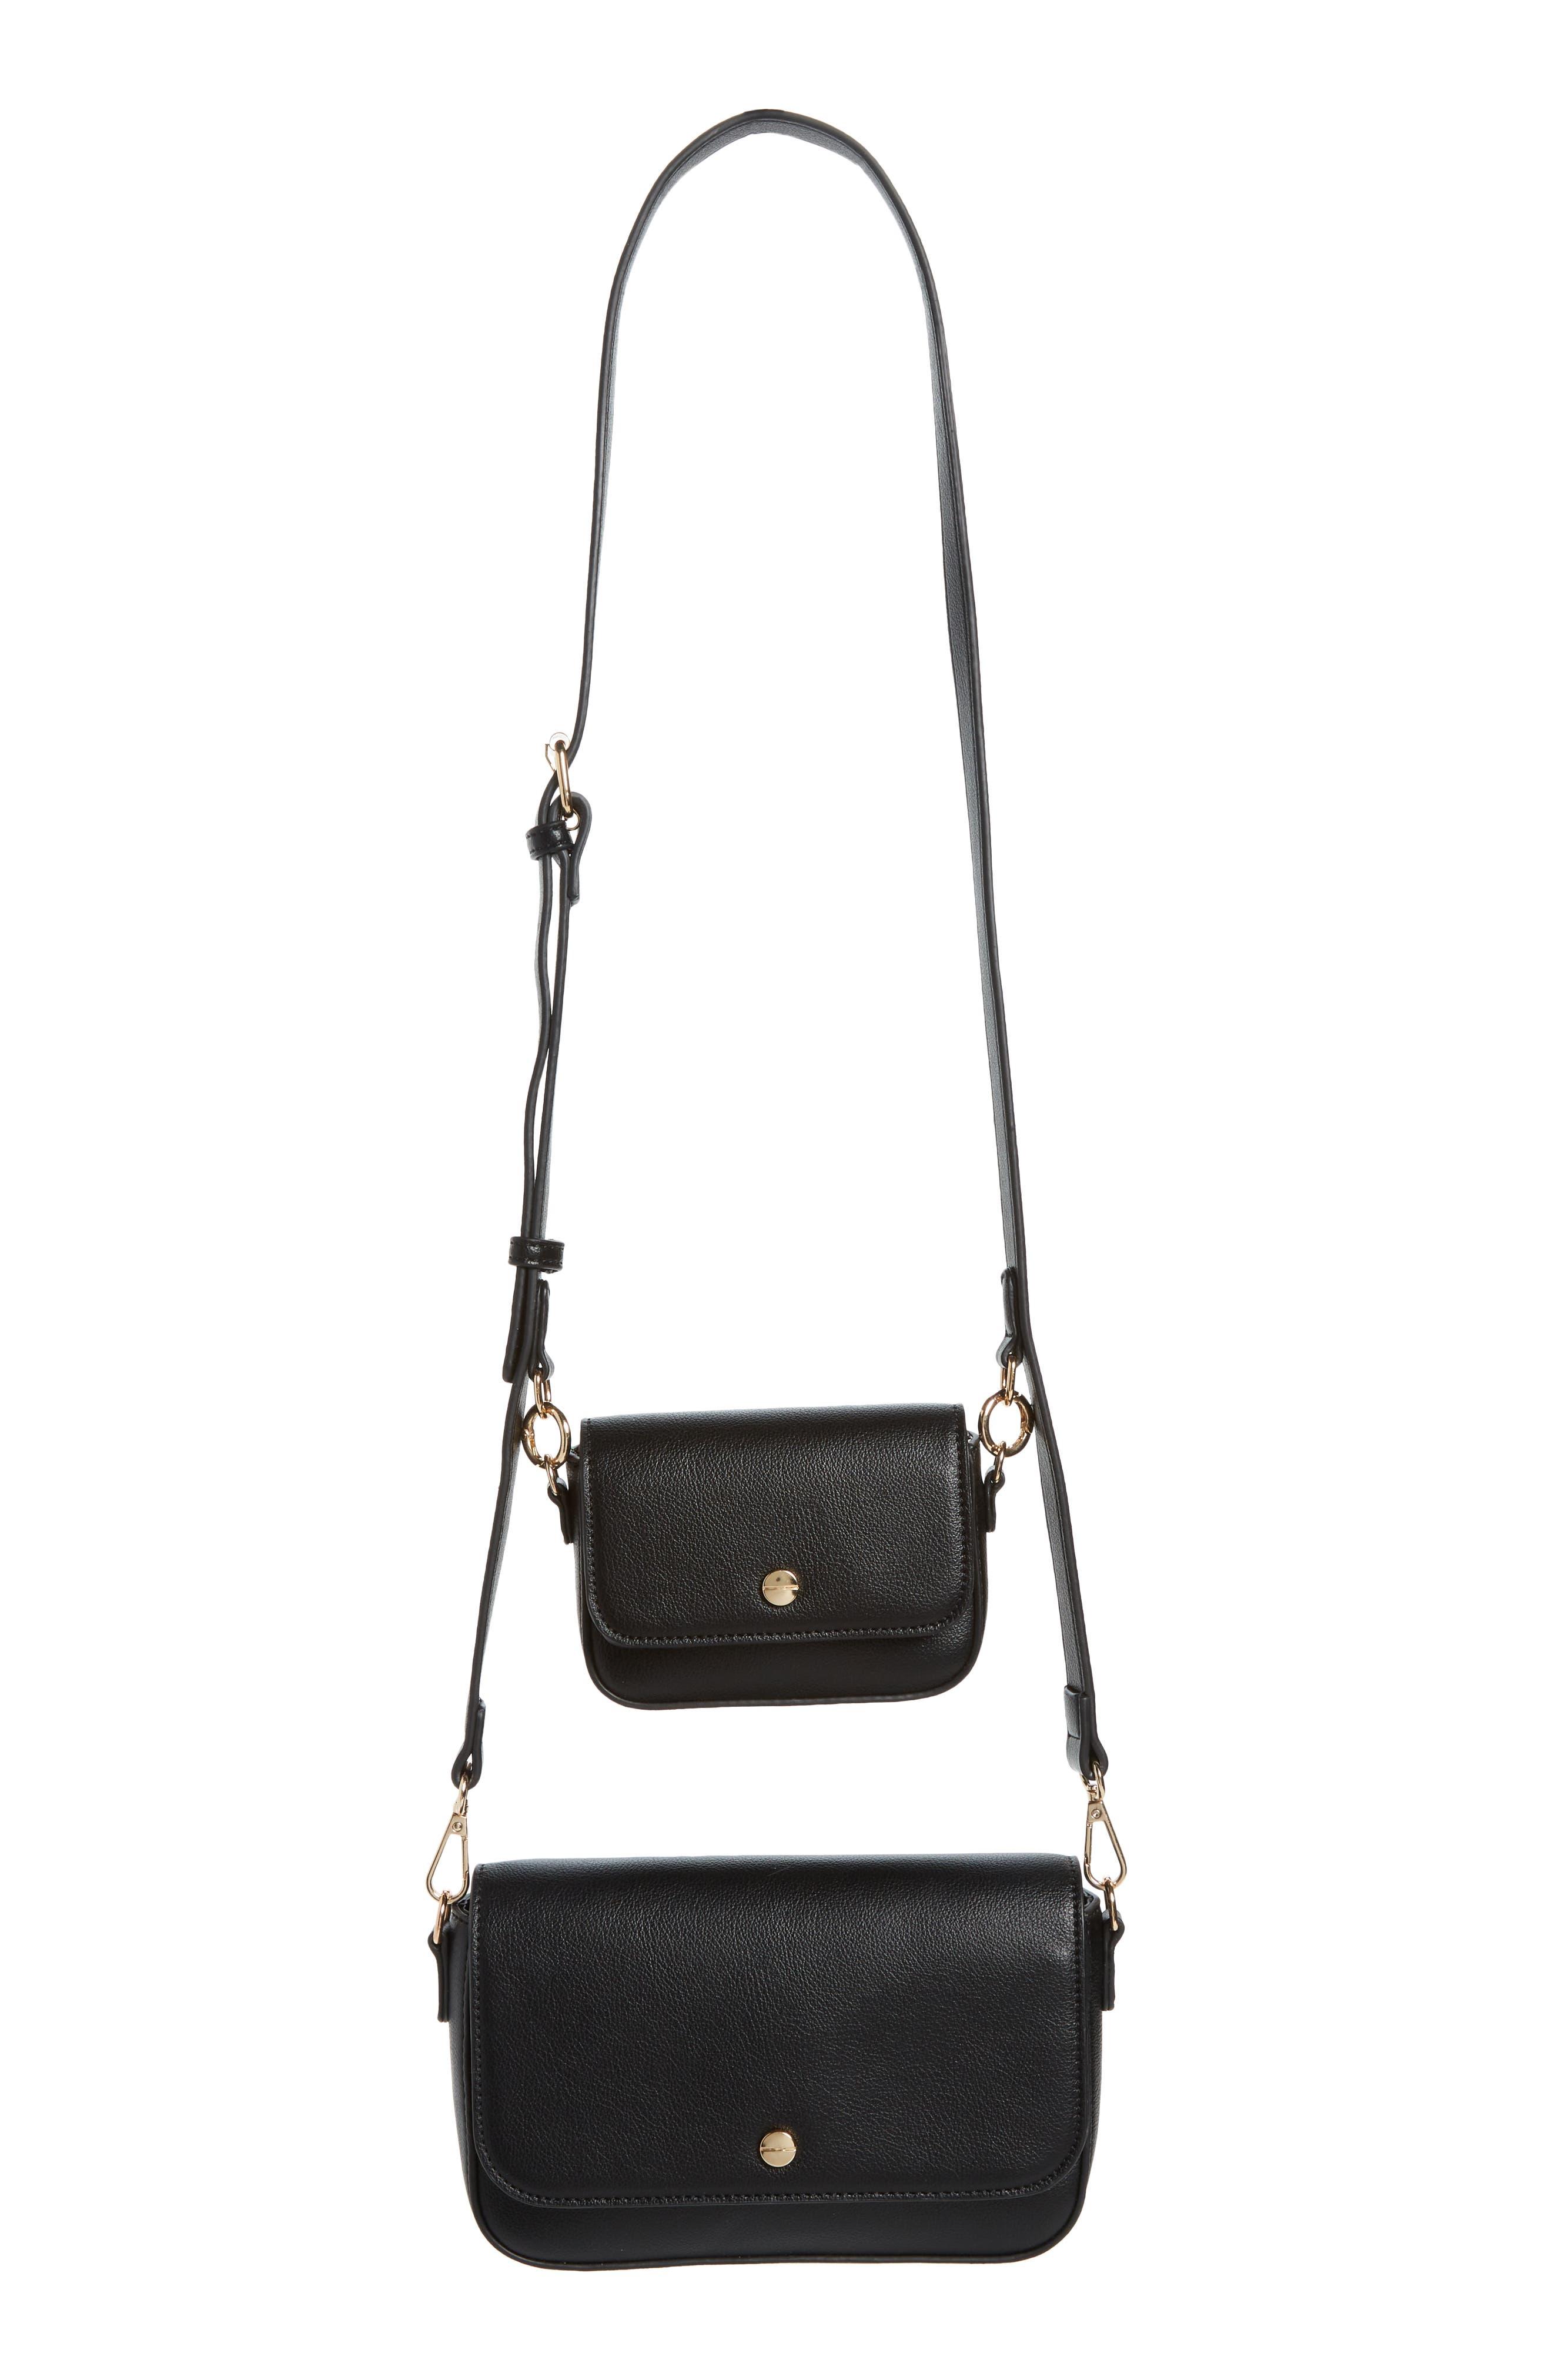 Mali + Lili 2-Piece Vegan Leather Crossbody Bag